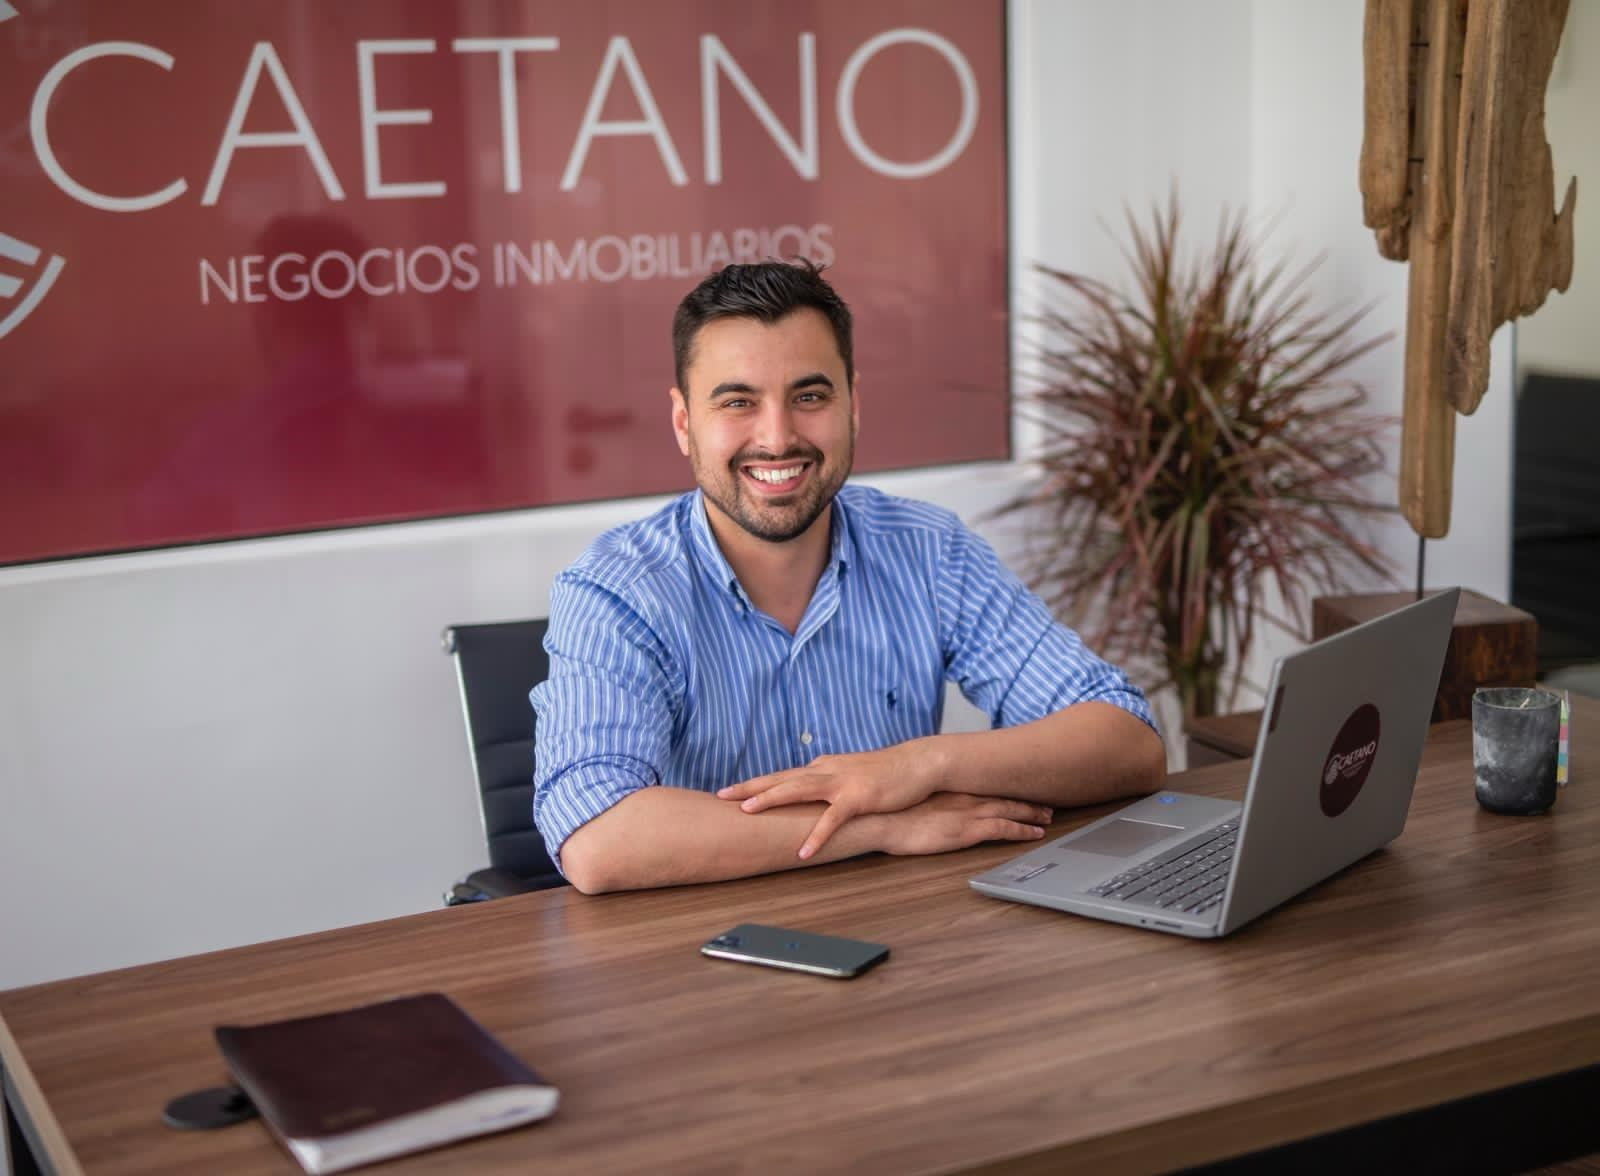 Damian Caetano